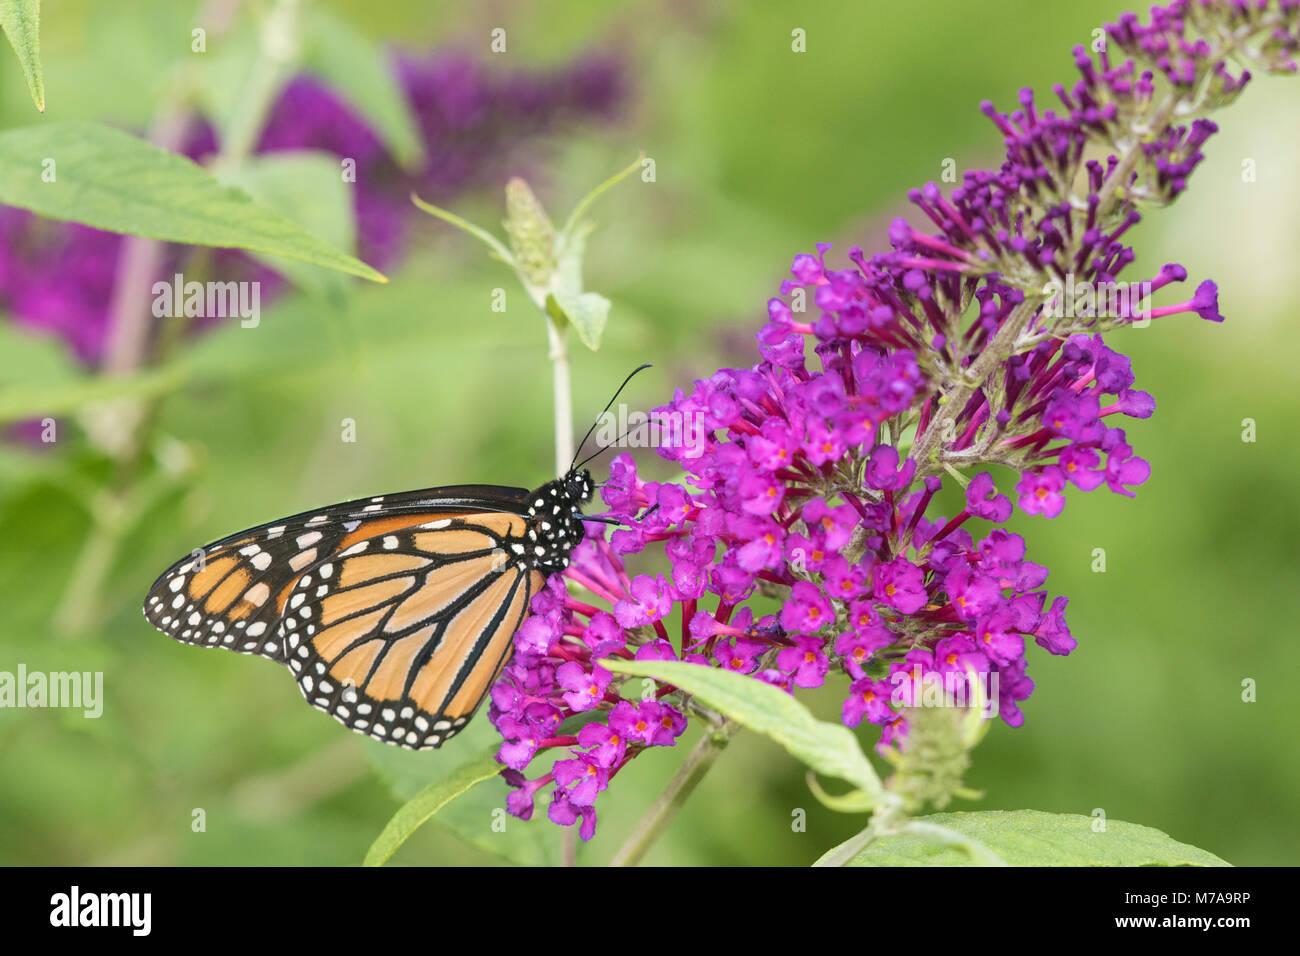 03536-05605 Monarch Butterfly (Danus plexippus) on Butterfly Bush (Buddleia davidii),  Marion Co., IL - Stock Image